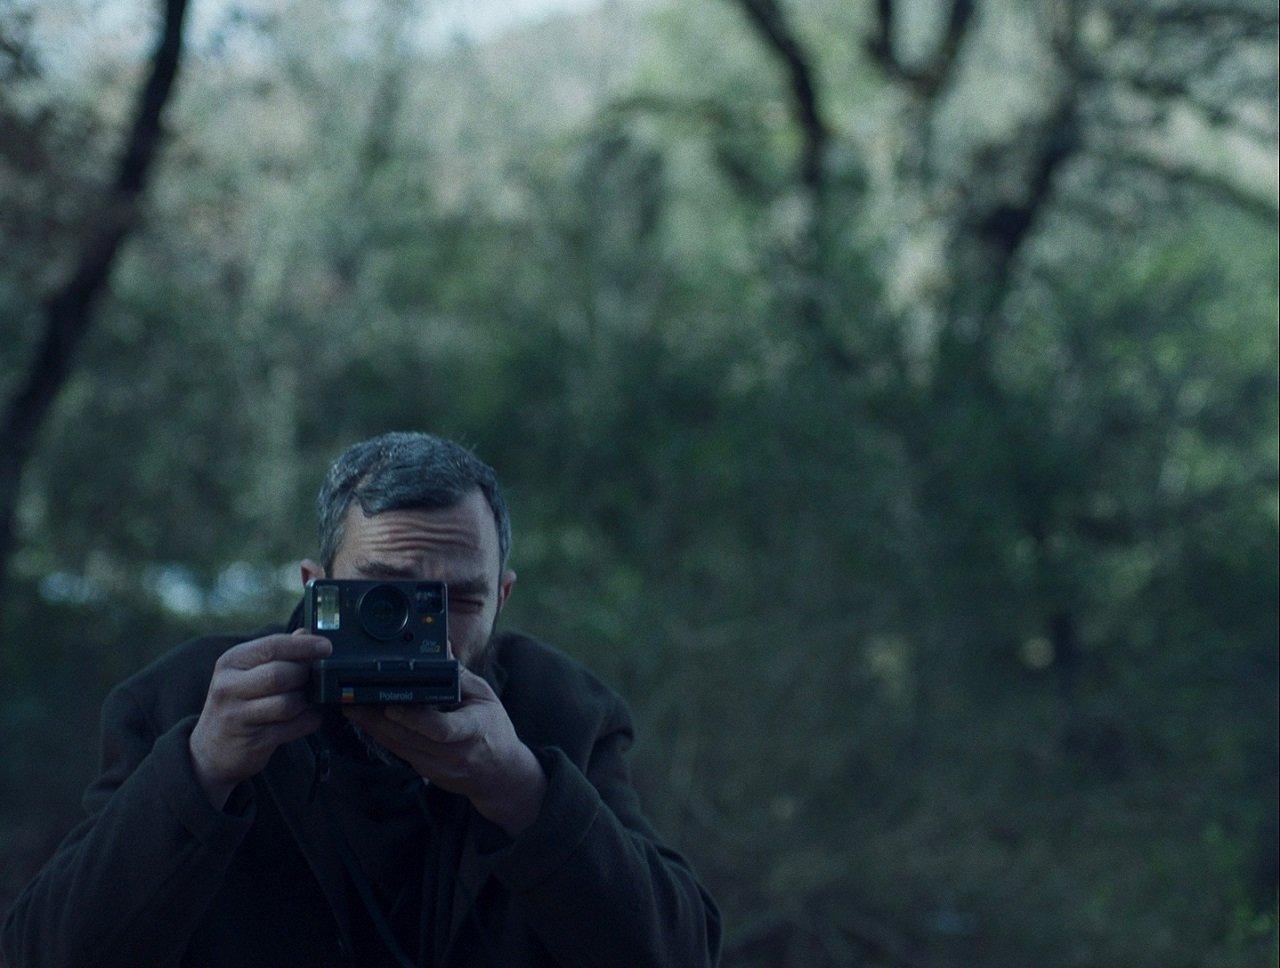 Mila (Apples): recensione del film di Christos Nikou